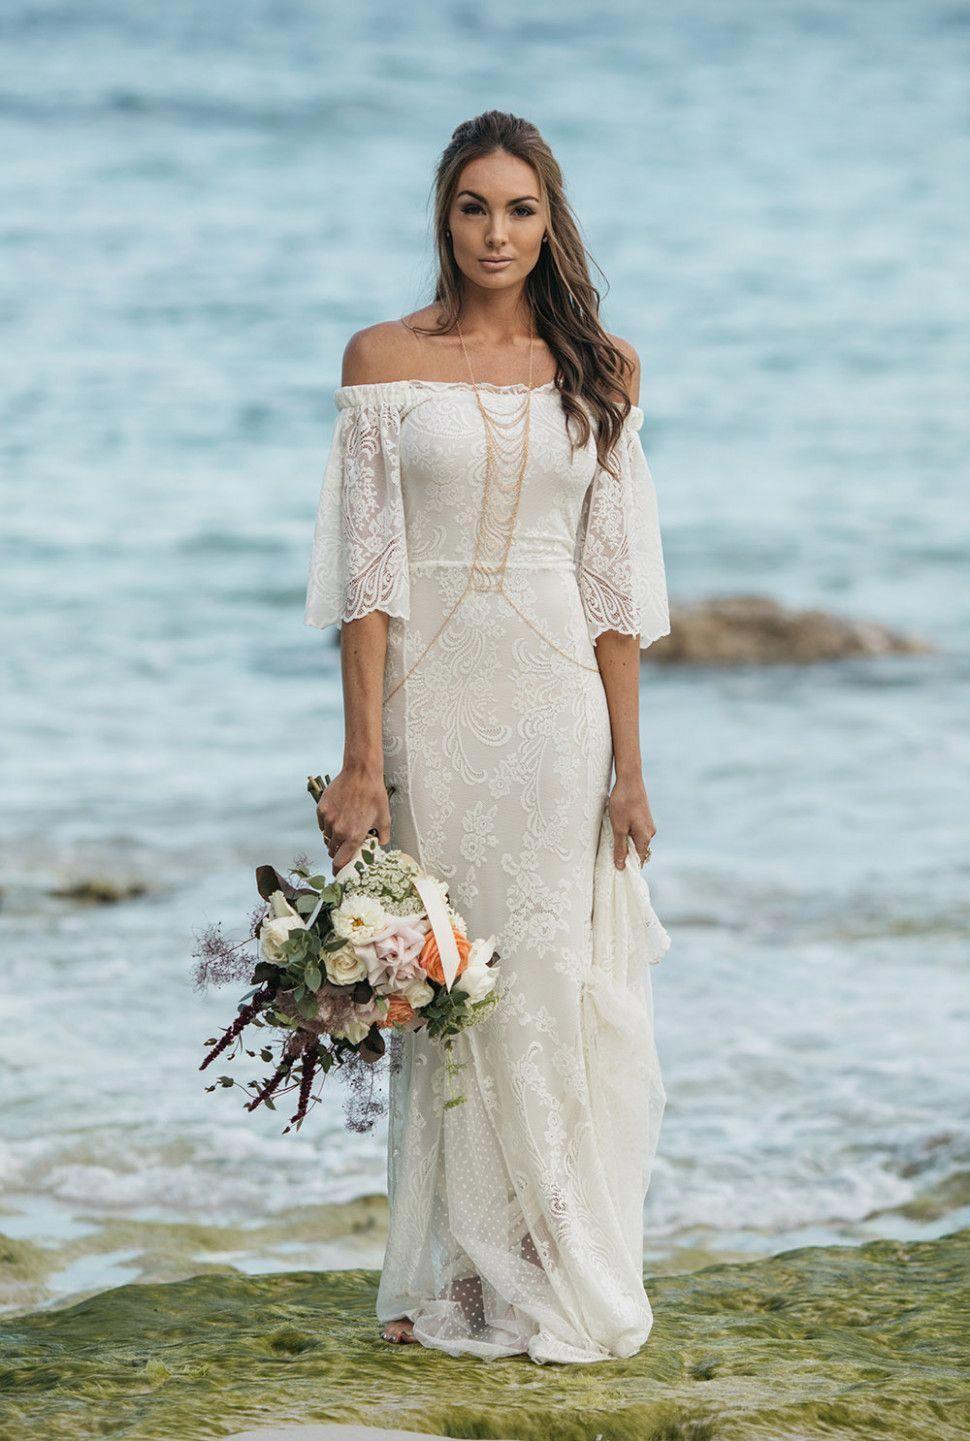 Best beach wedding dresses  Boho Beach Wedding Outfit  tips on choosing beach wedding dresses